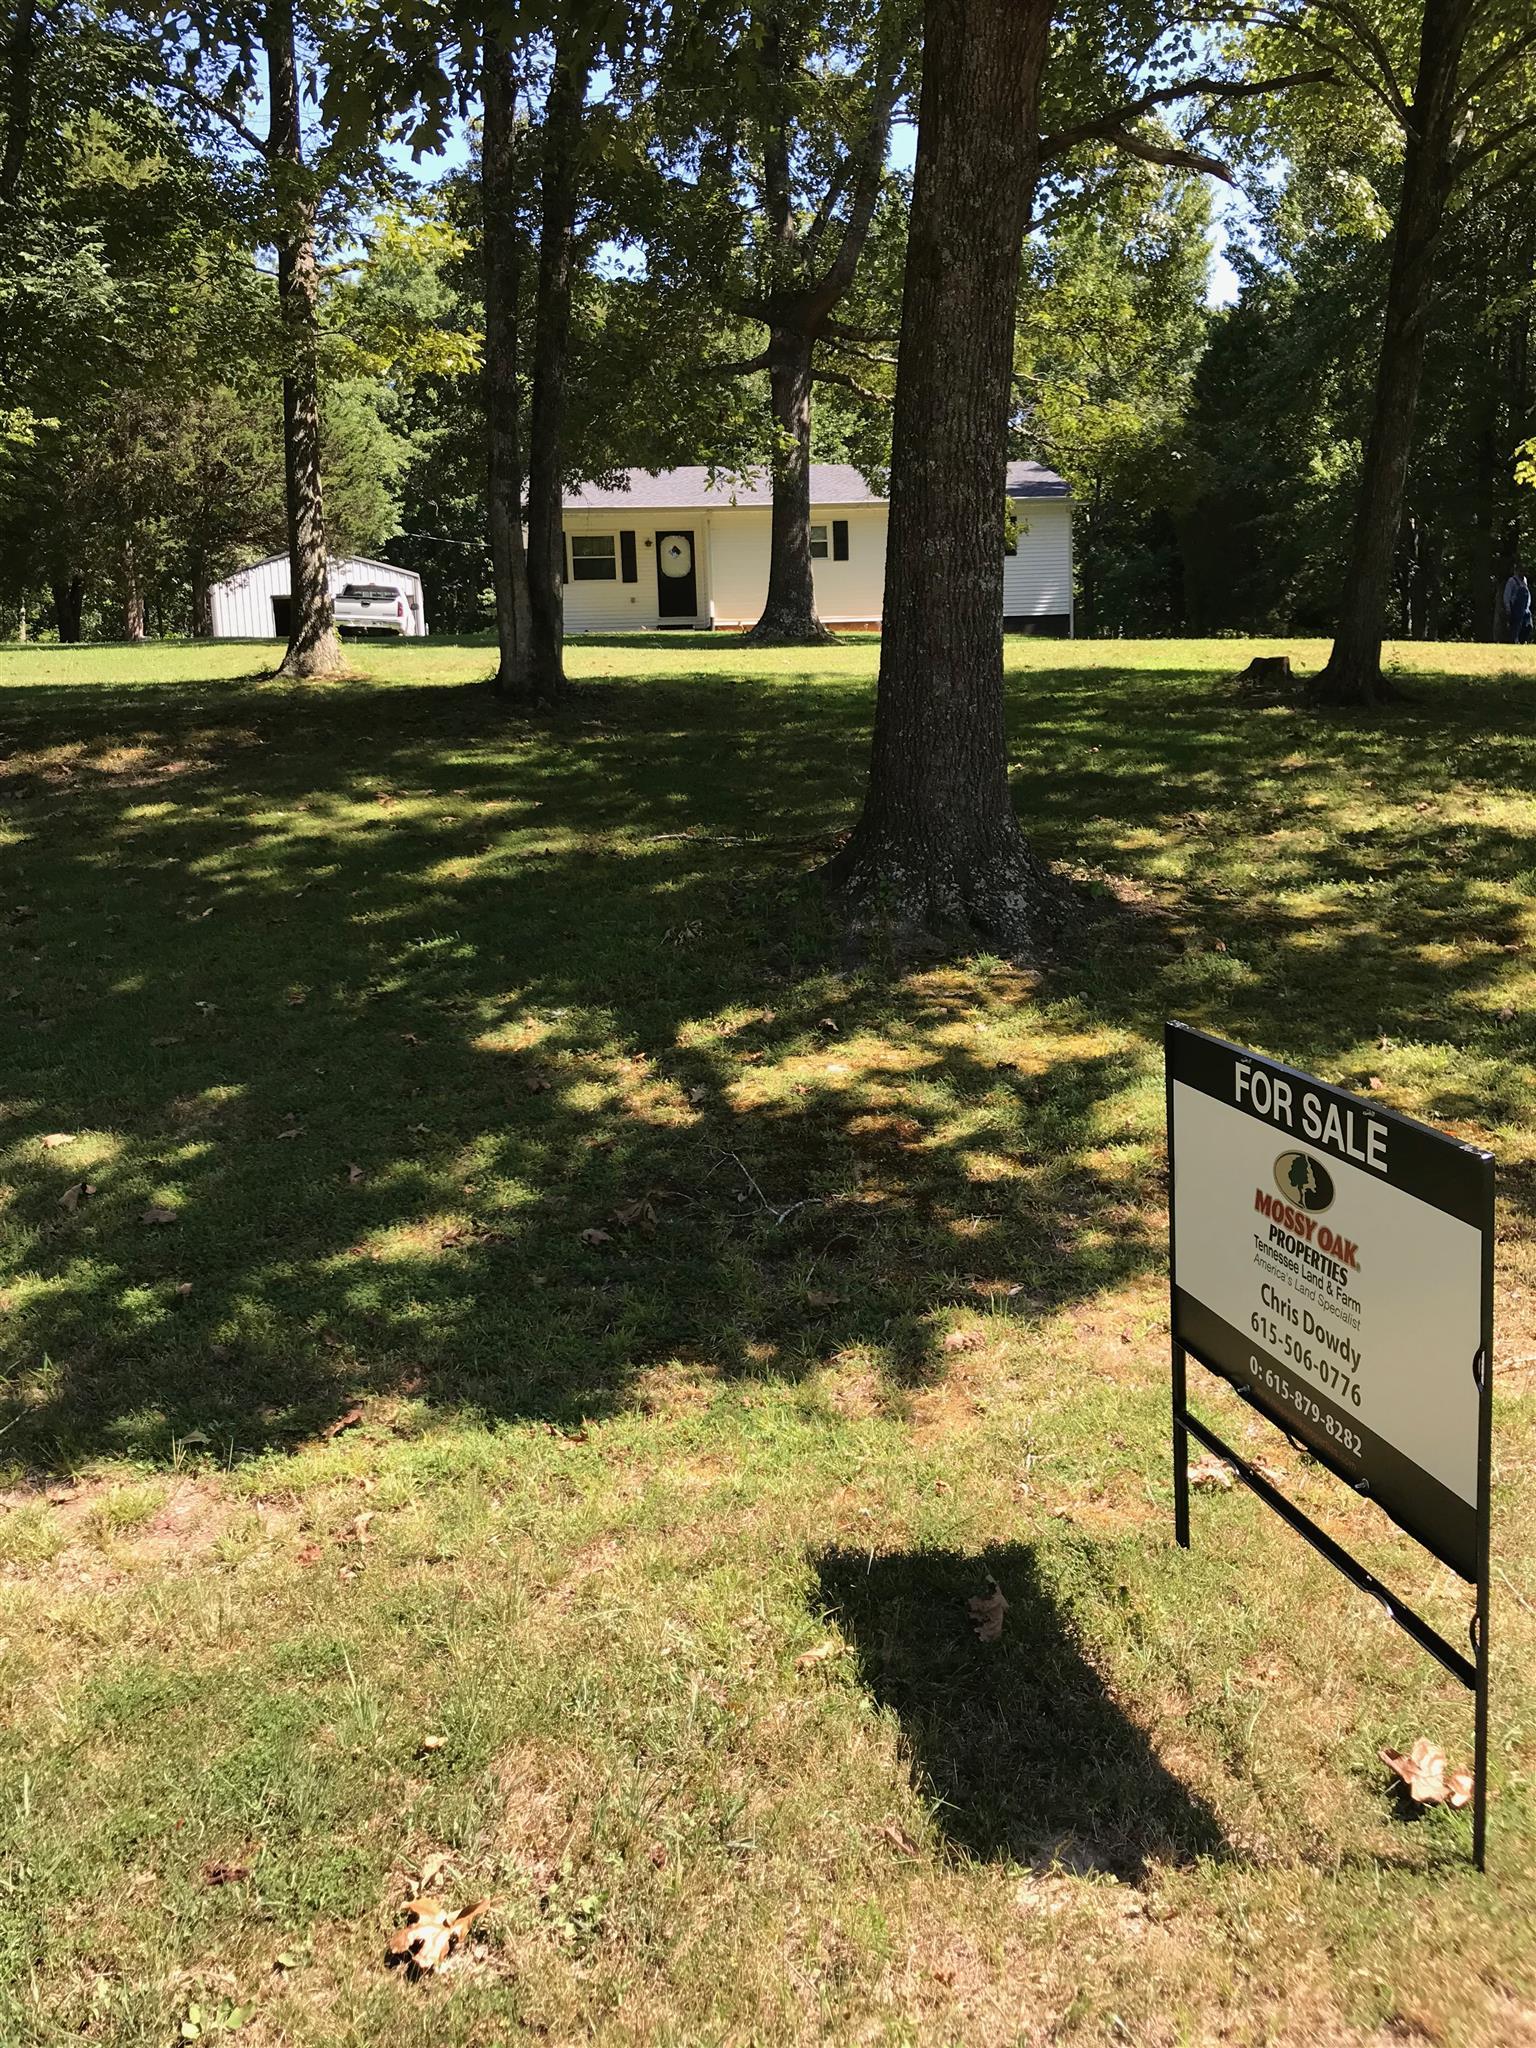 1075 Sandy's Camp Rd, Big Sandy, TN 38221 - Big Sandy, TN real estate listing